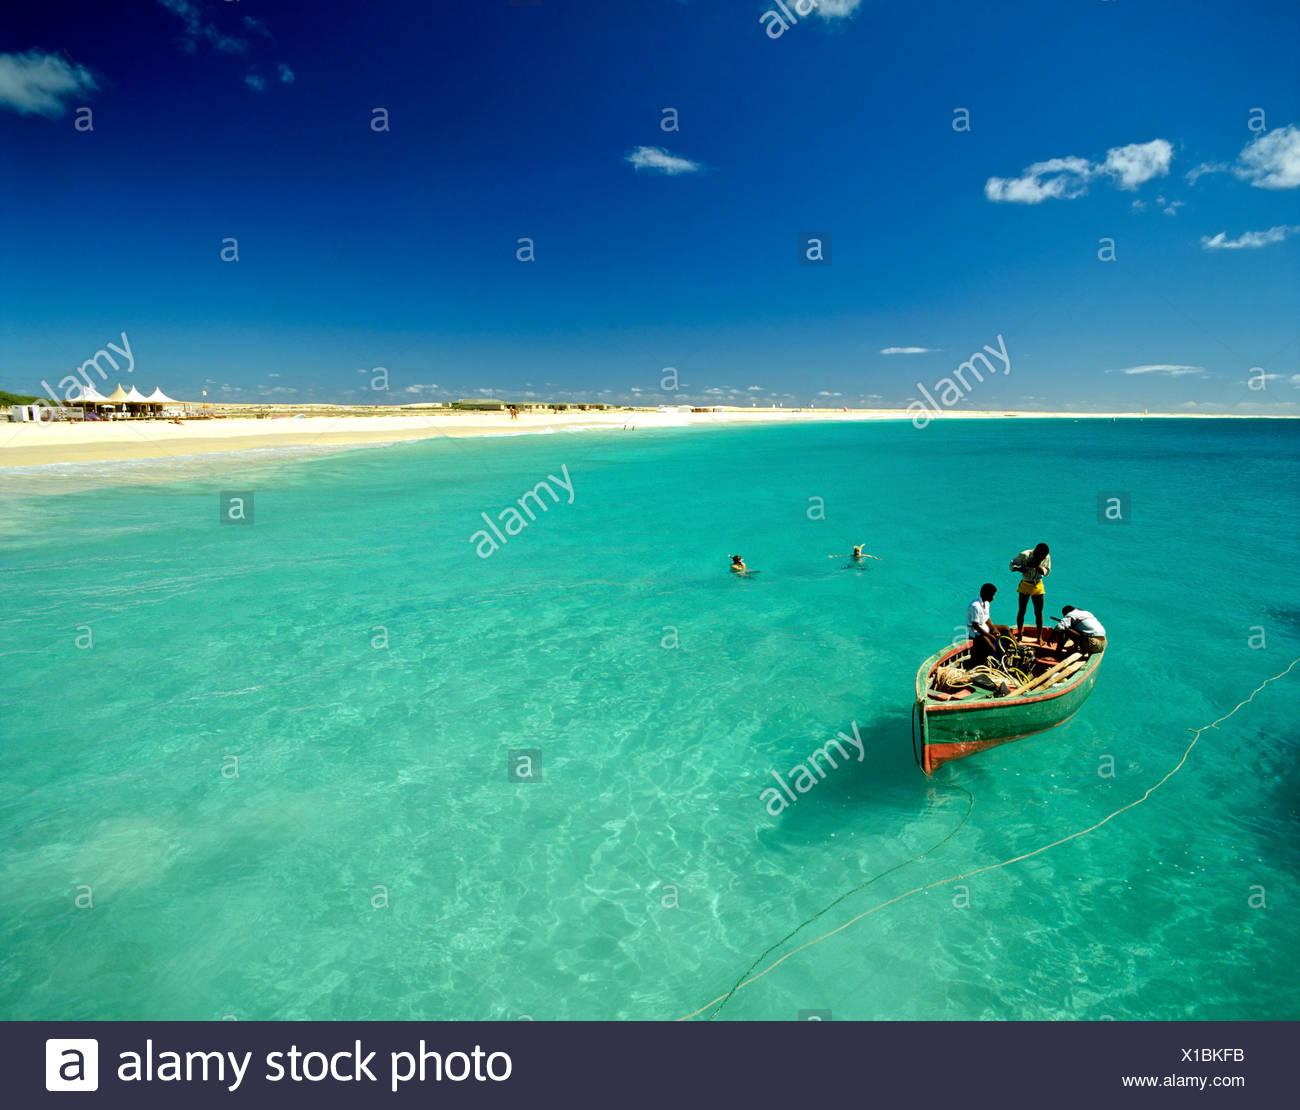 Fishing boat off the coast of Sal Island, Cape Verde, Atlantic Ocean Stock Photo